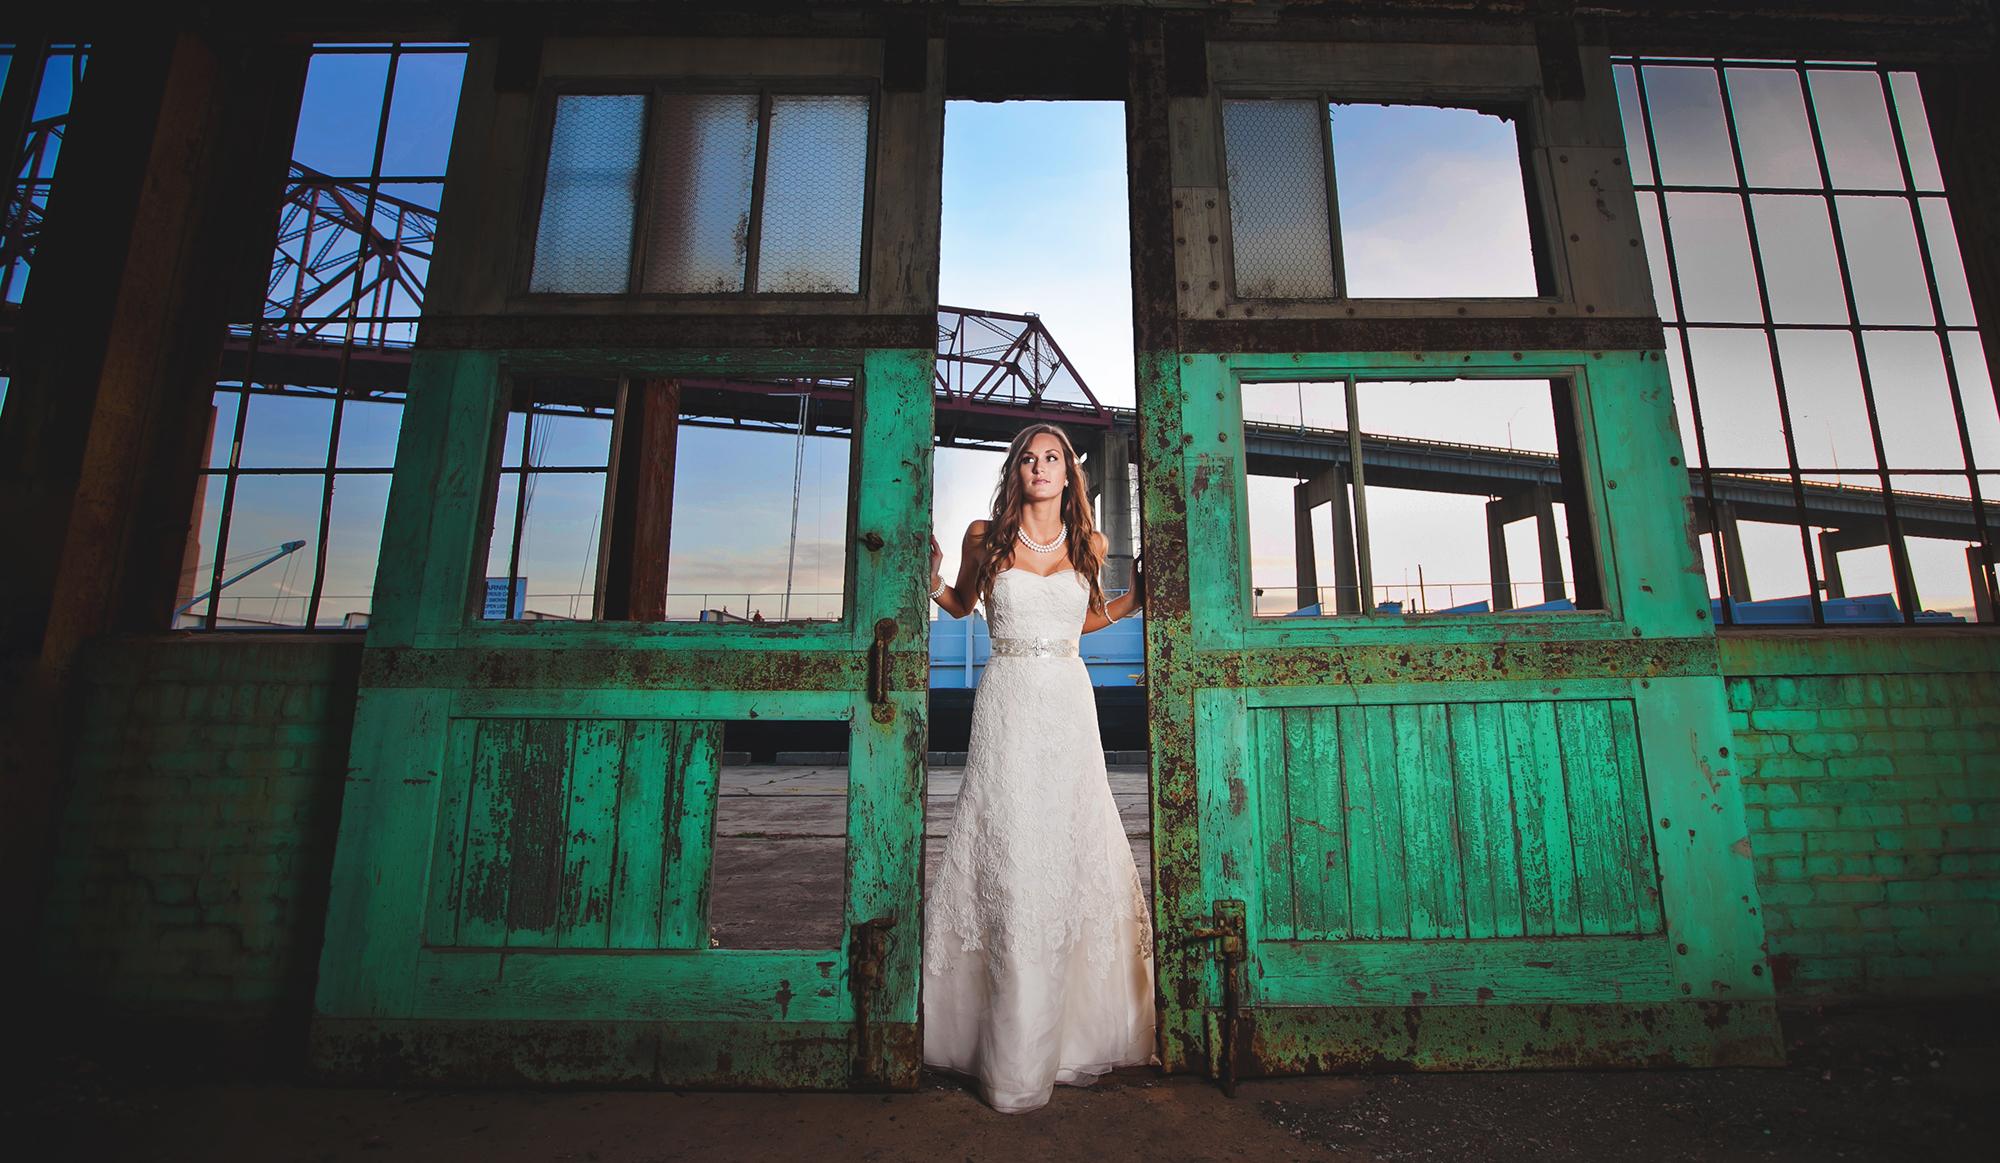 adam-szarmack-weddings-bridal-portrait-jax.jpg